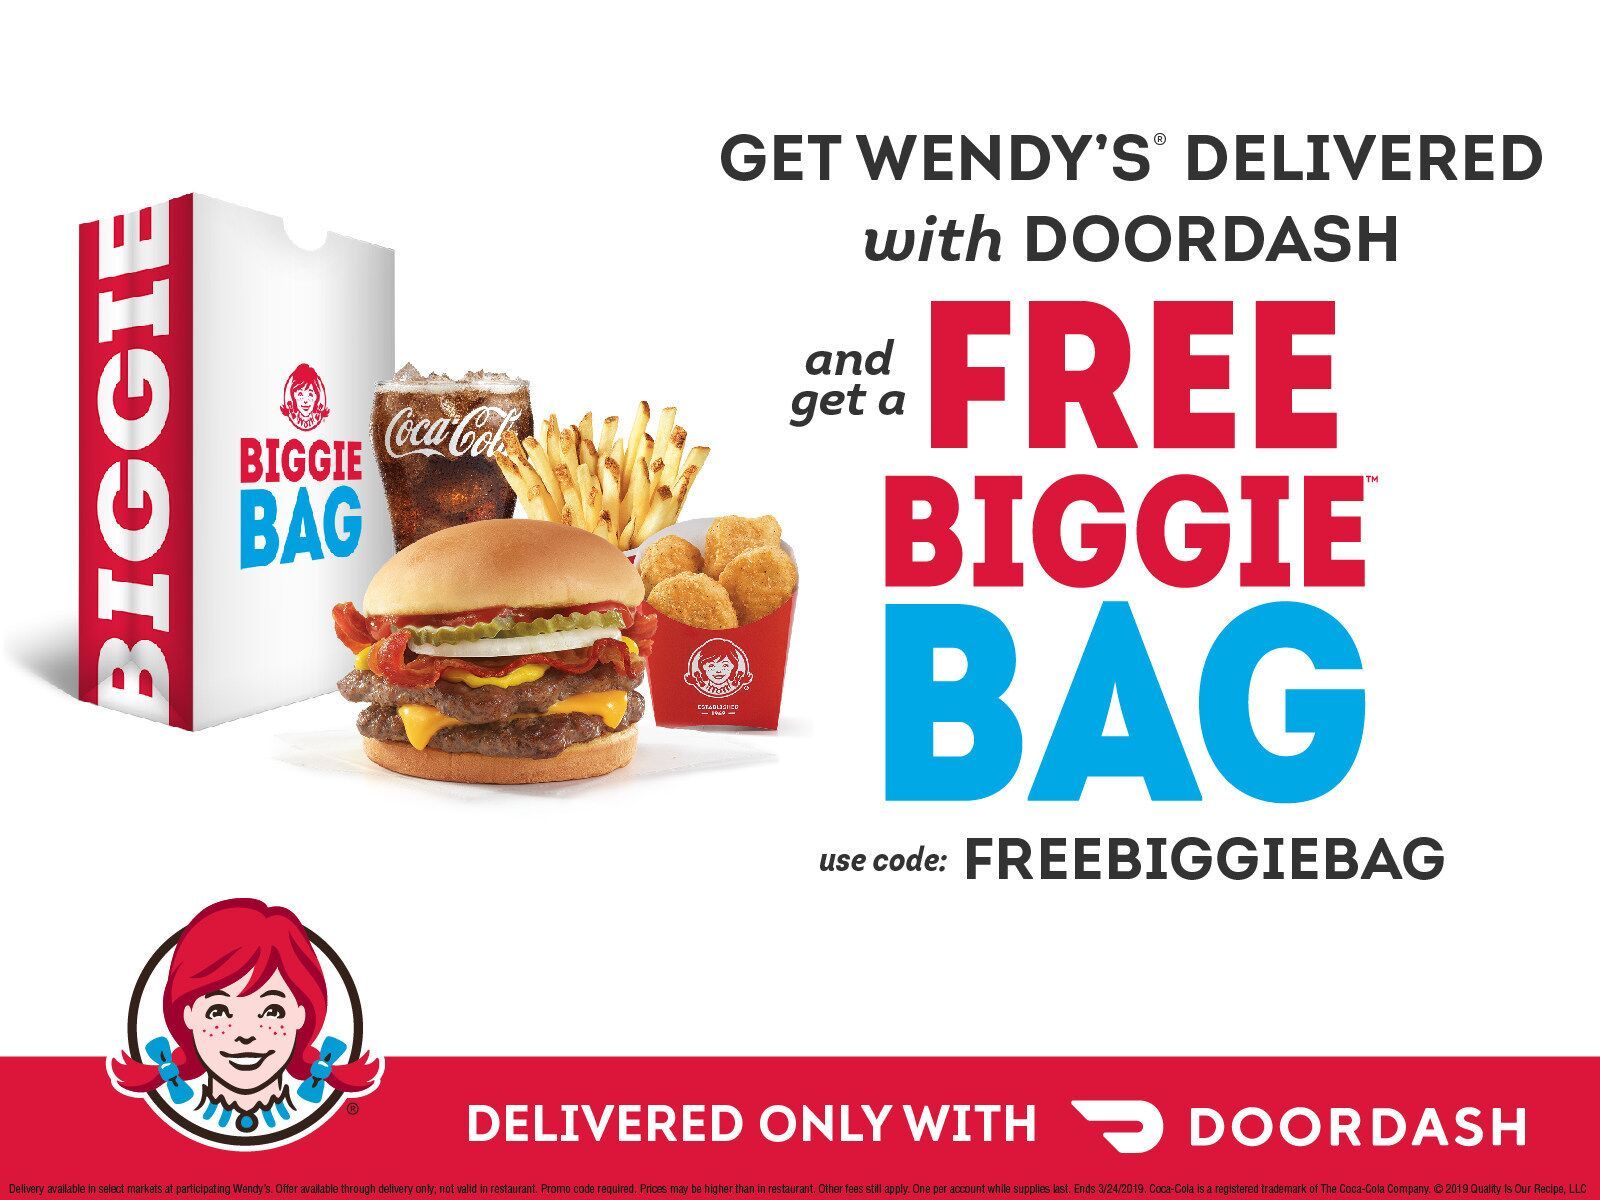 Free $5 Biggie Bag from Wendyu2019s and DoorDash is a slam dunk